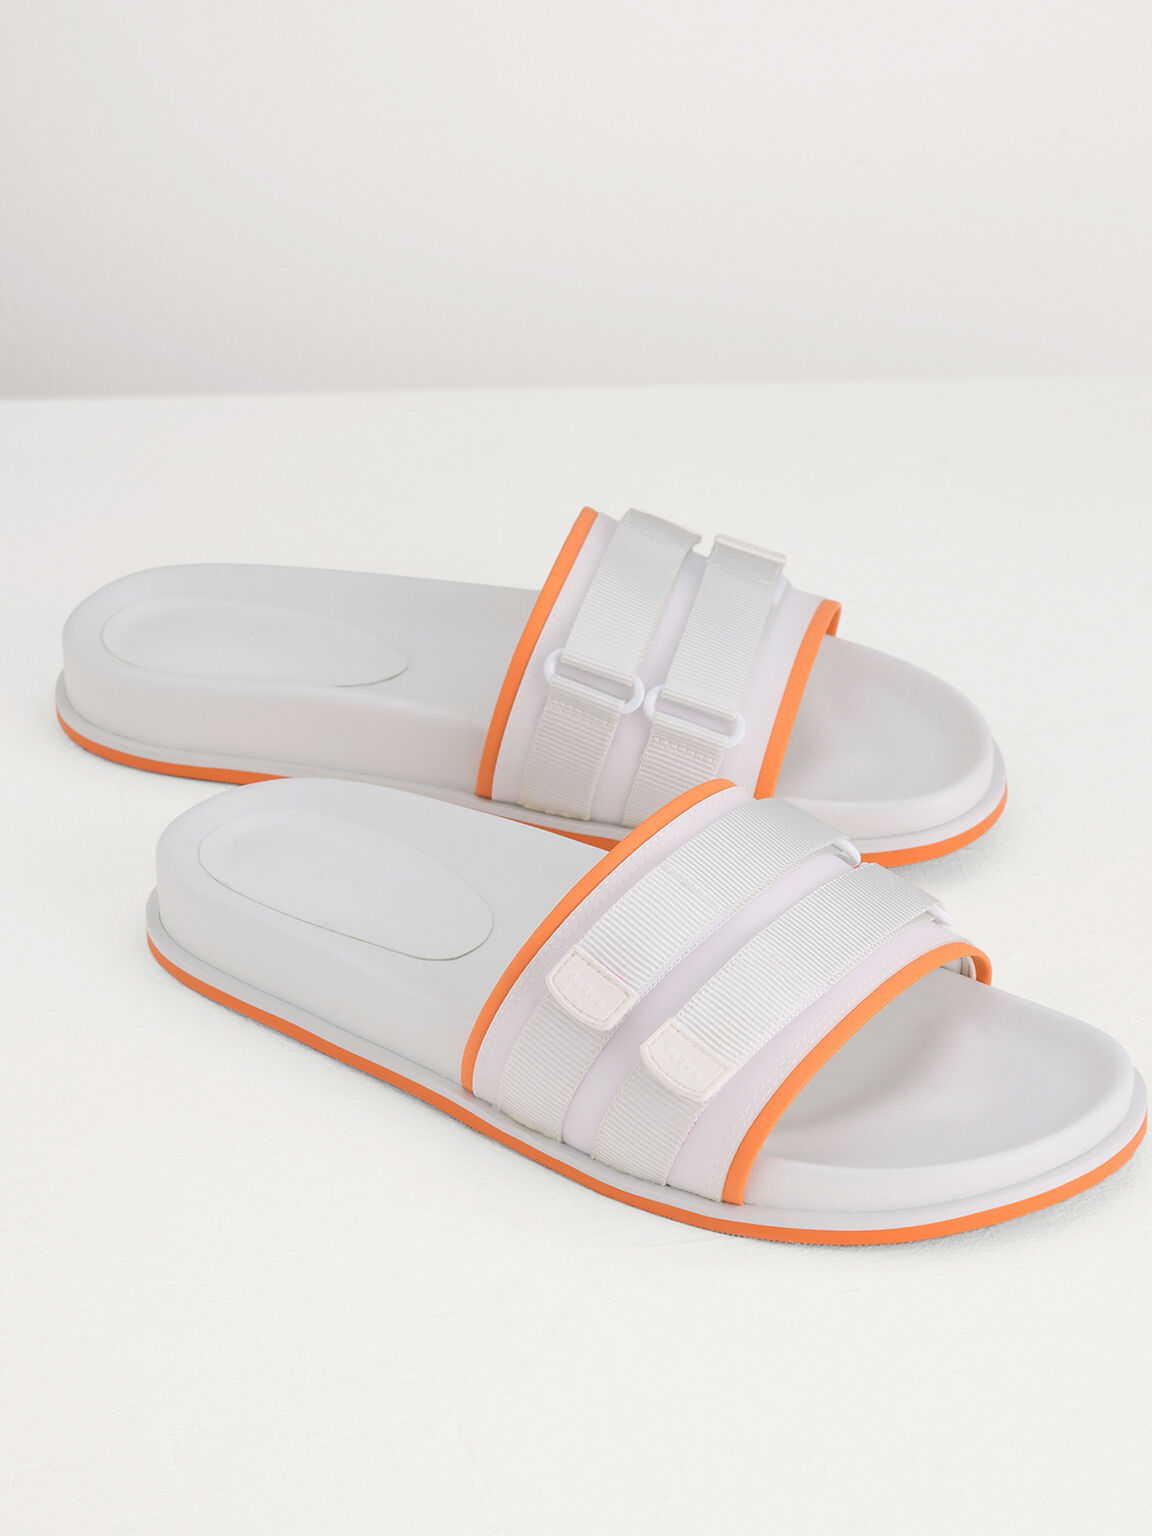 Velcro Slides in Two-Tone, White, hi-res